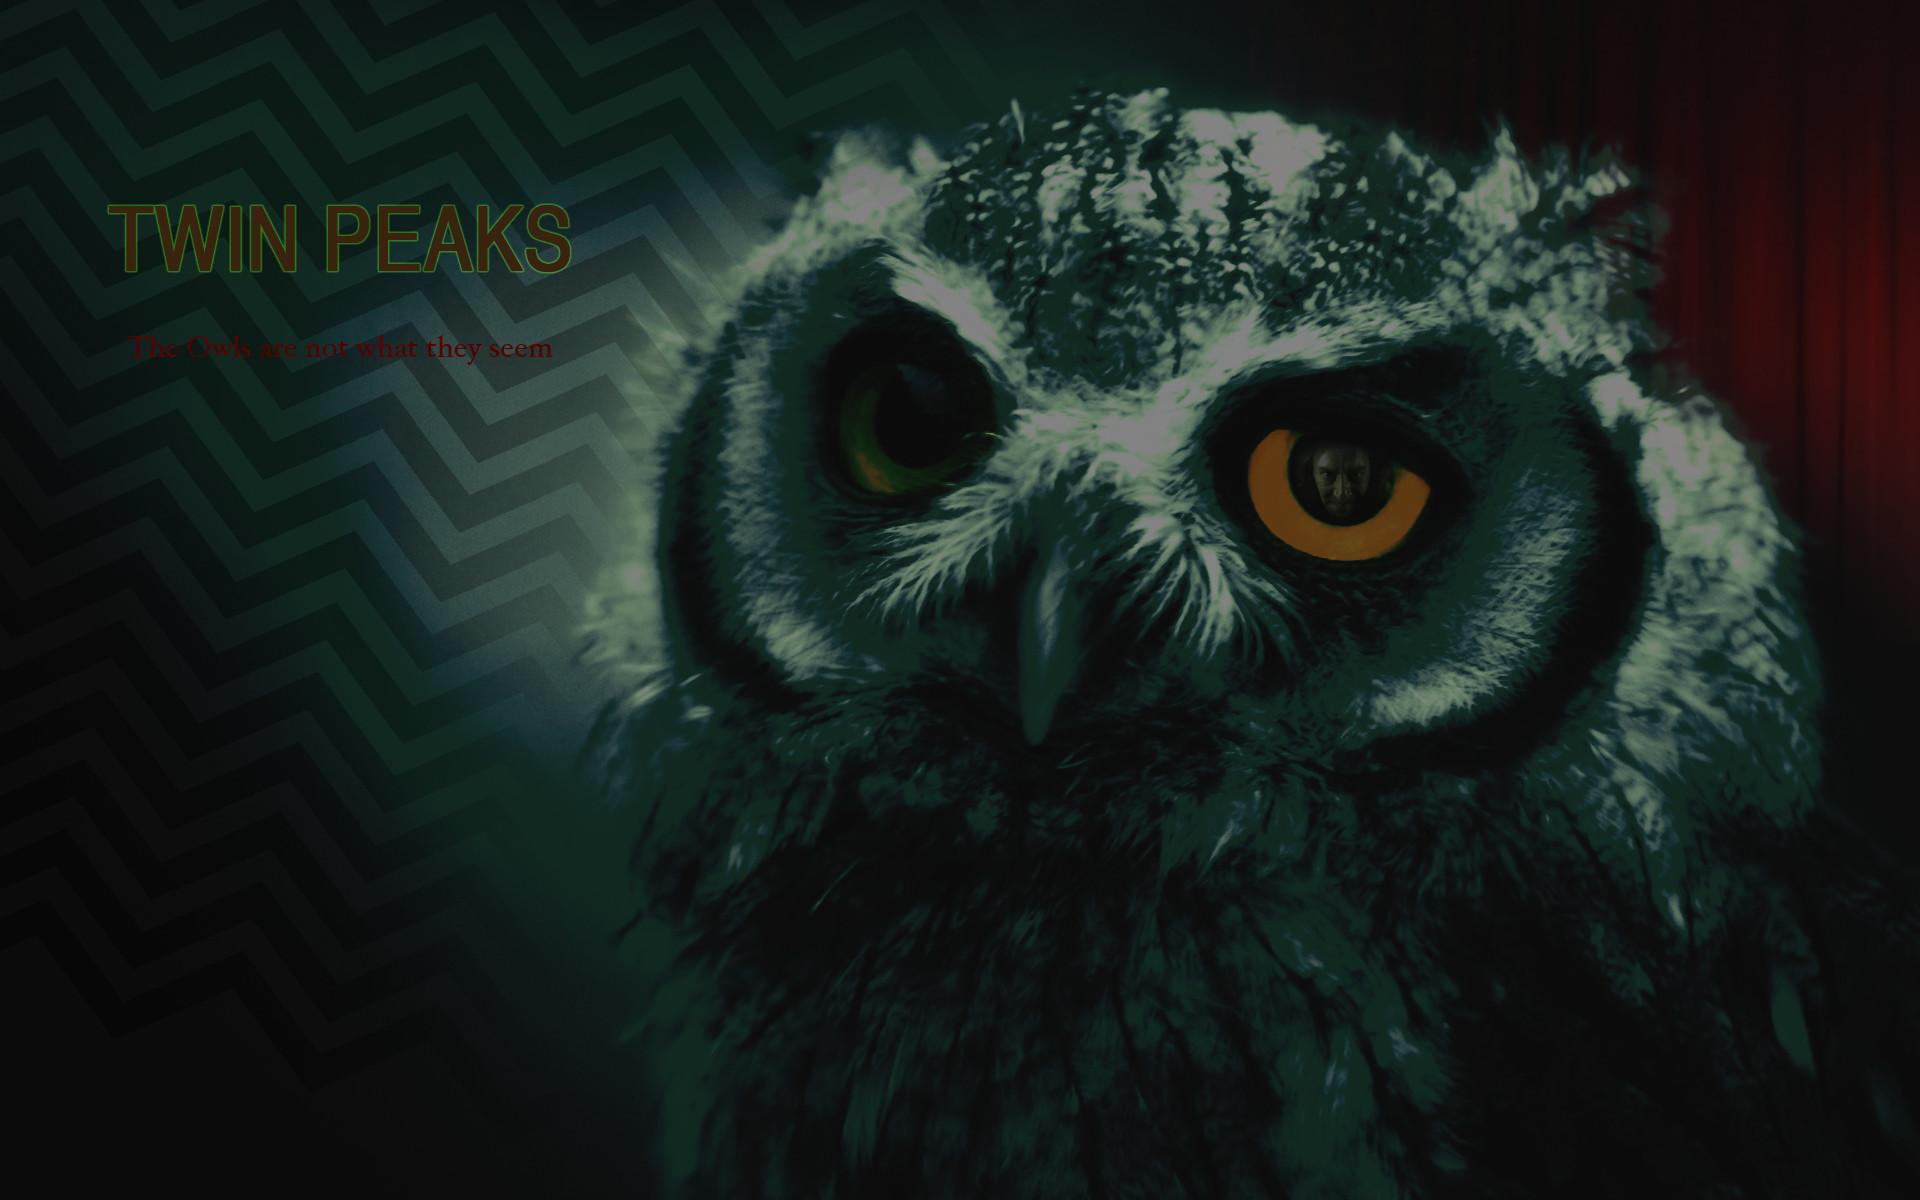 Twin Peaks HD Wallpapers for desktop download